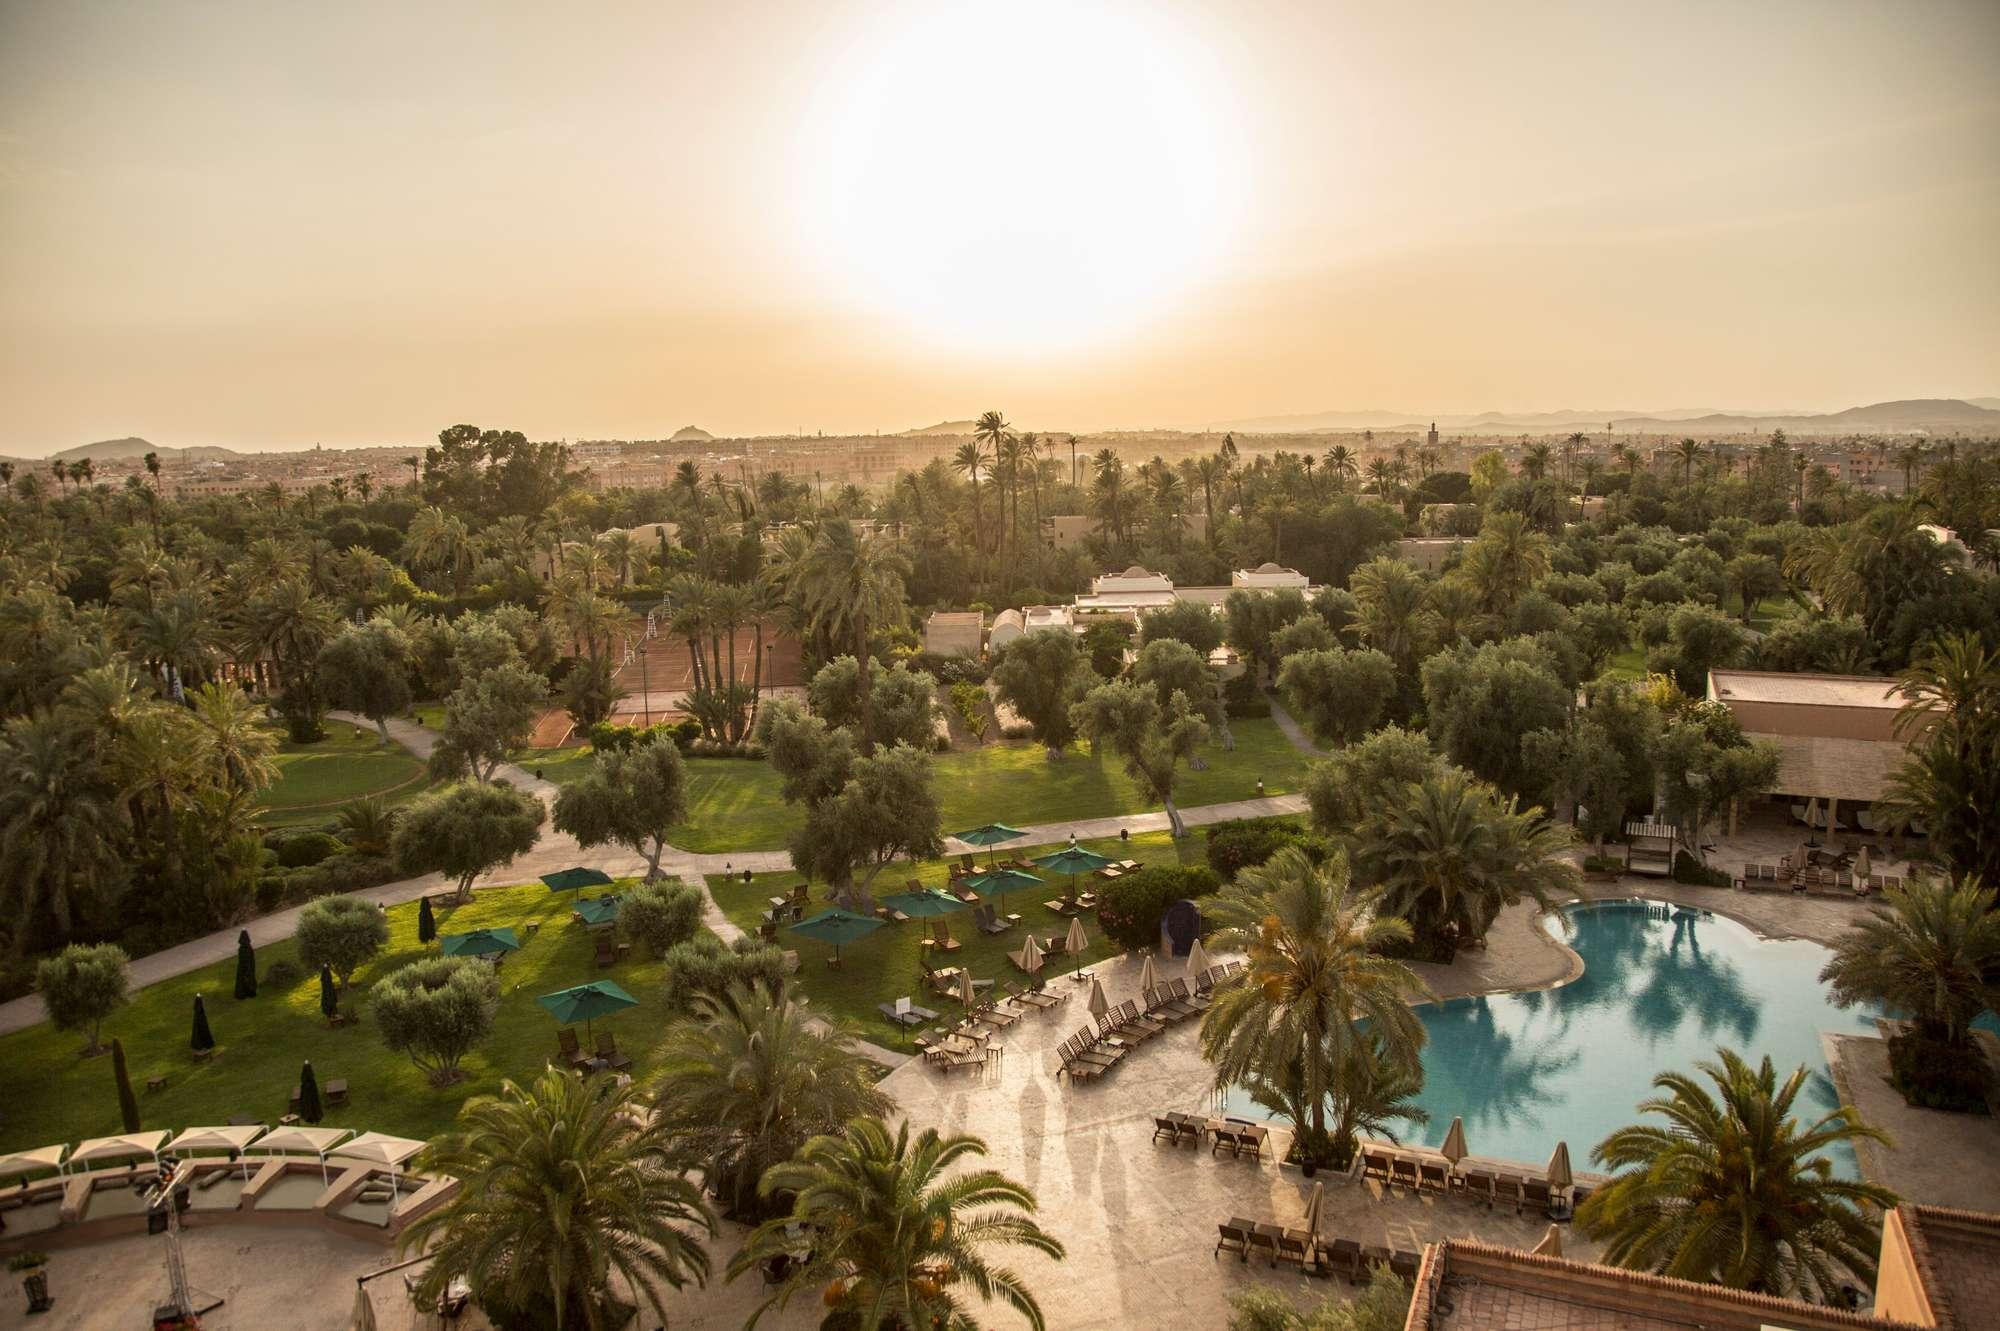 Sommerurlaub in Marokko 2018 Club Med